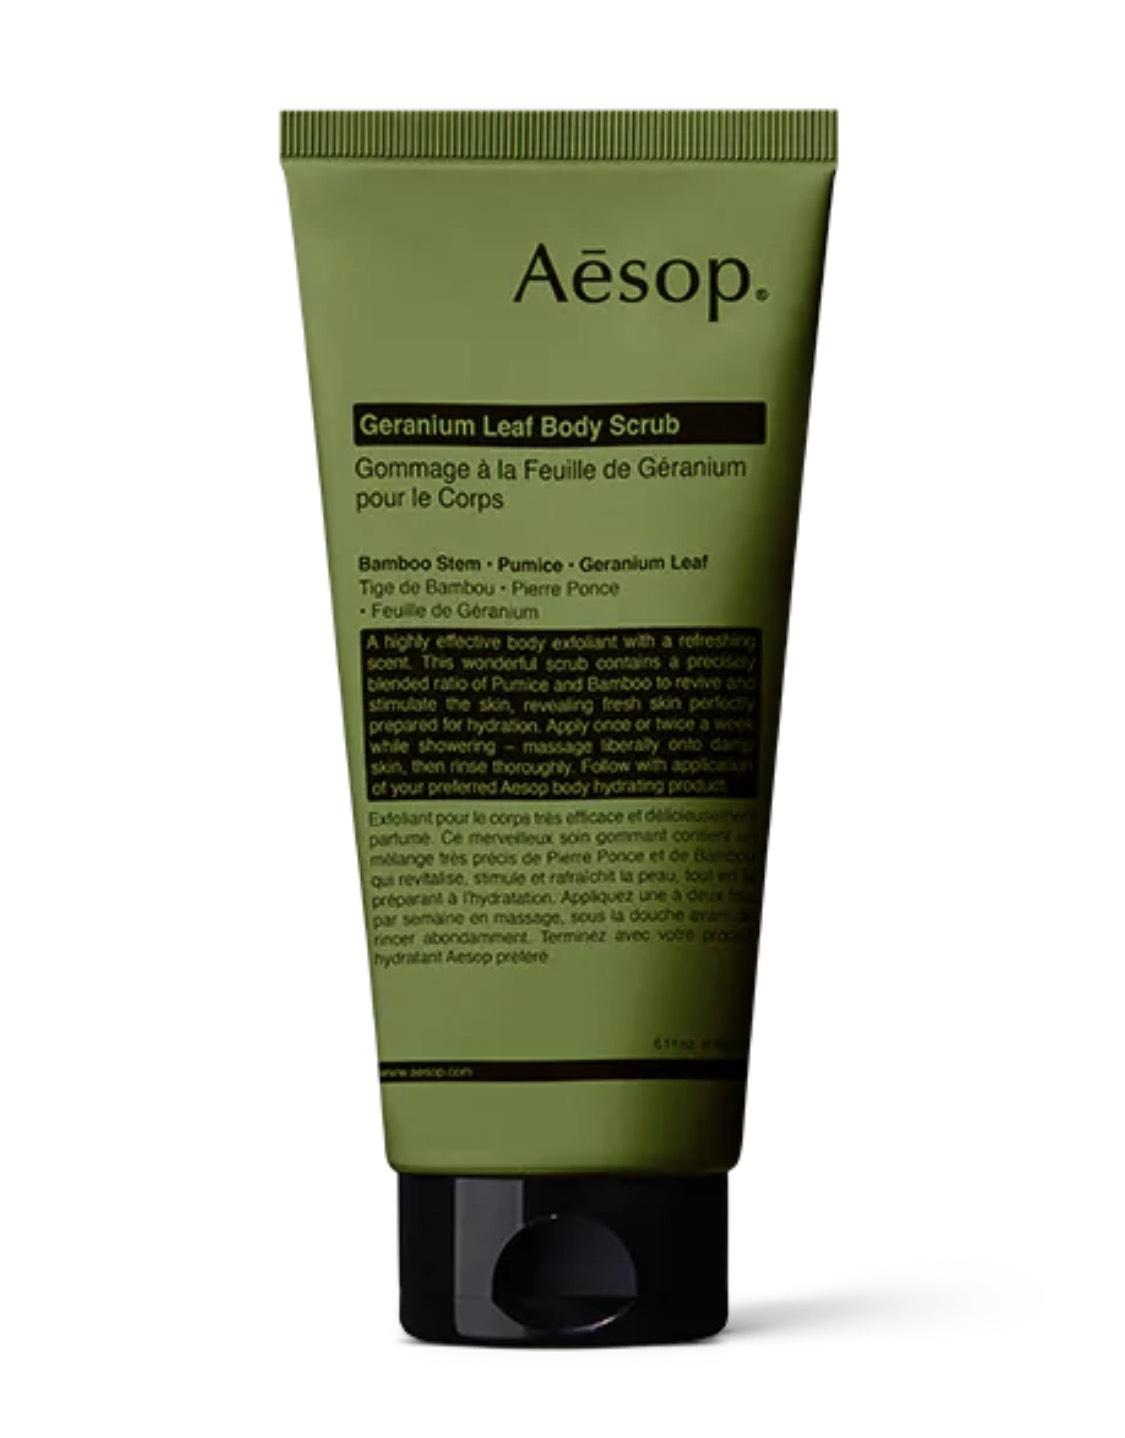 www.aesop.com